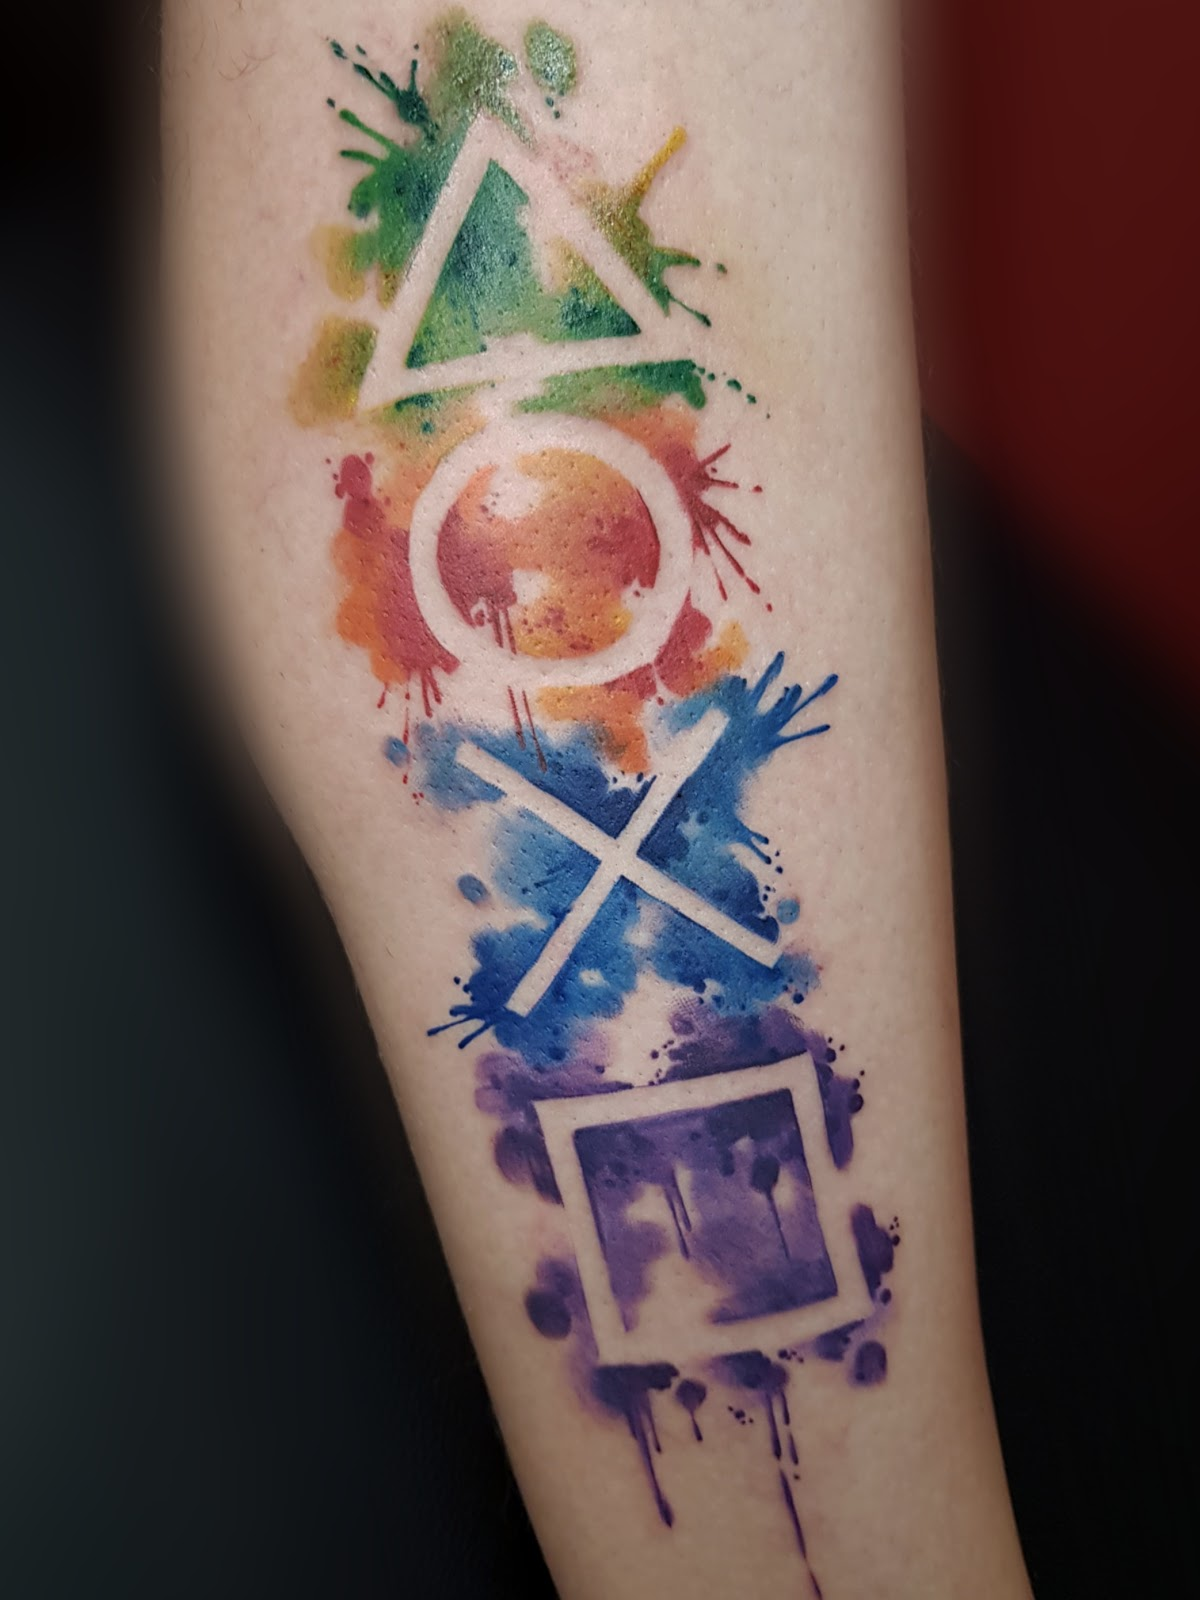 Tattoo-Play Station